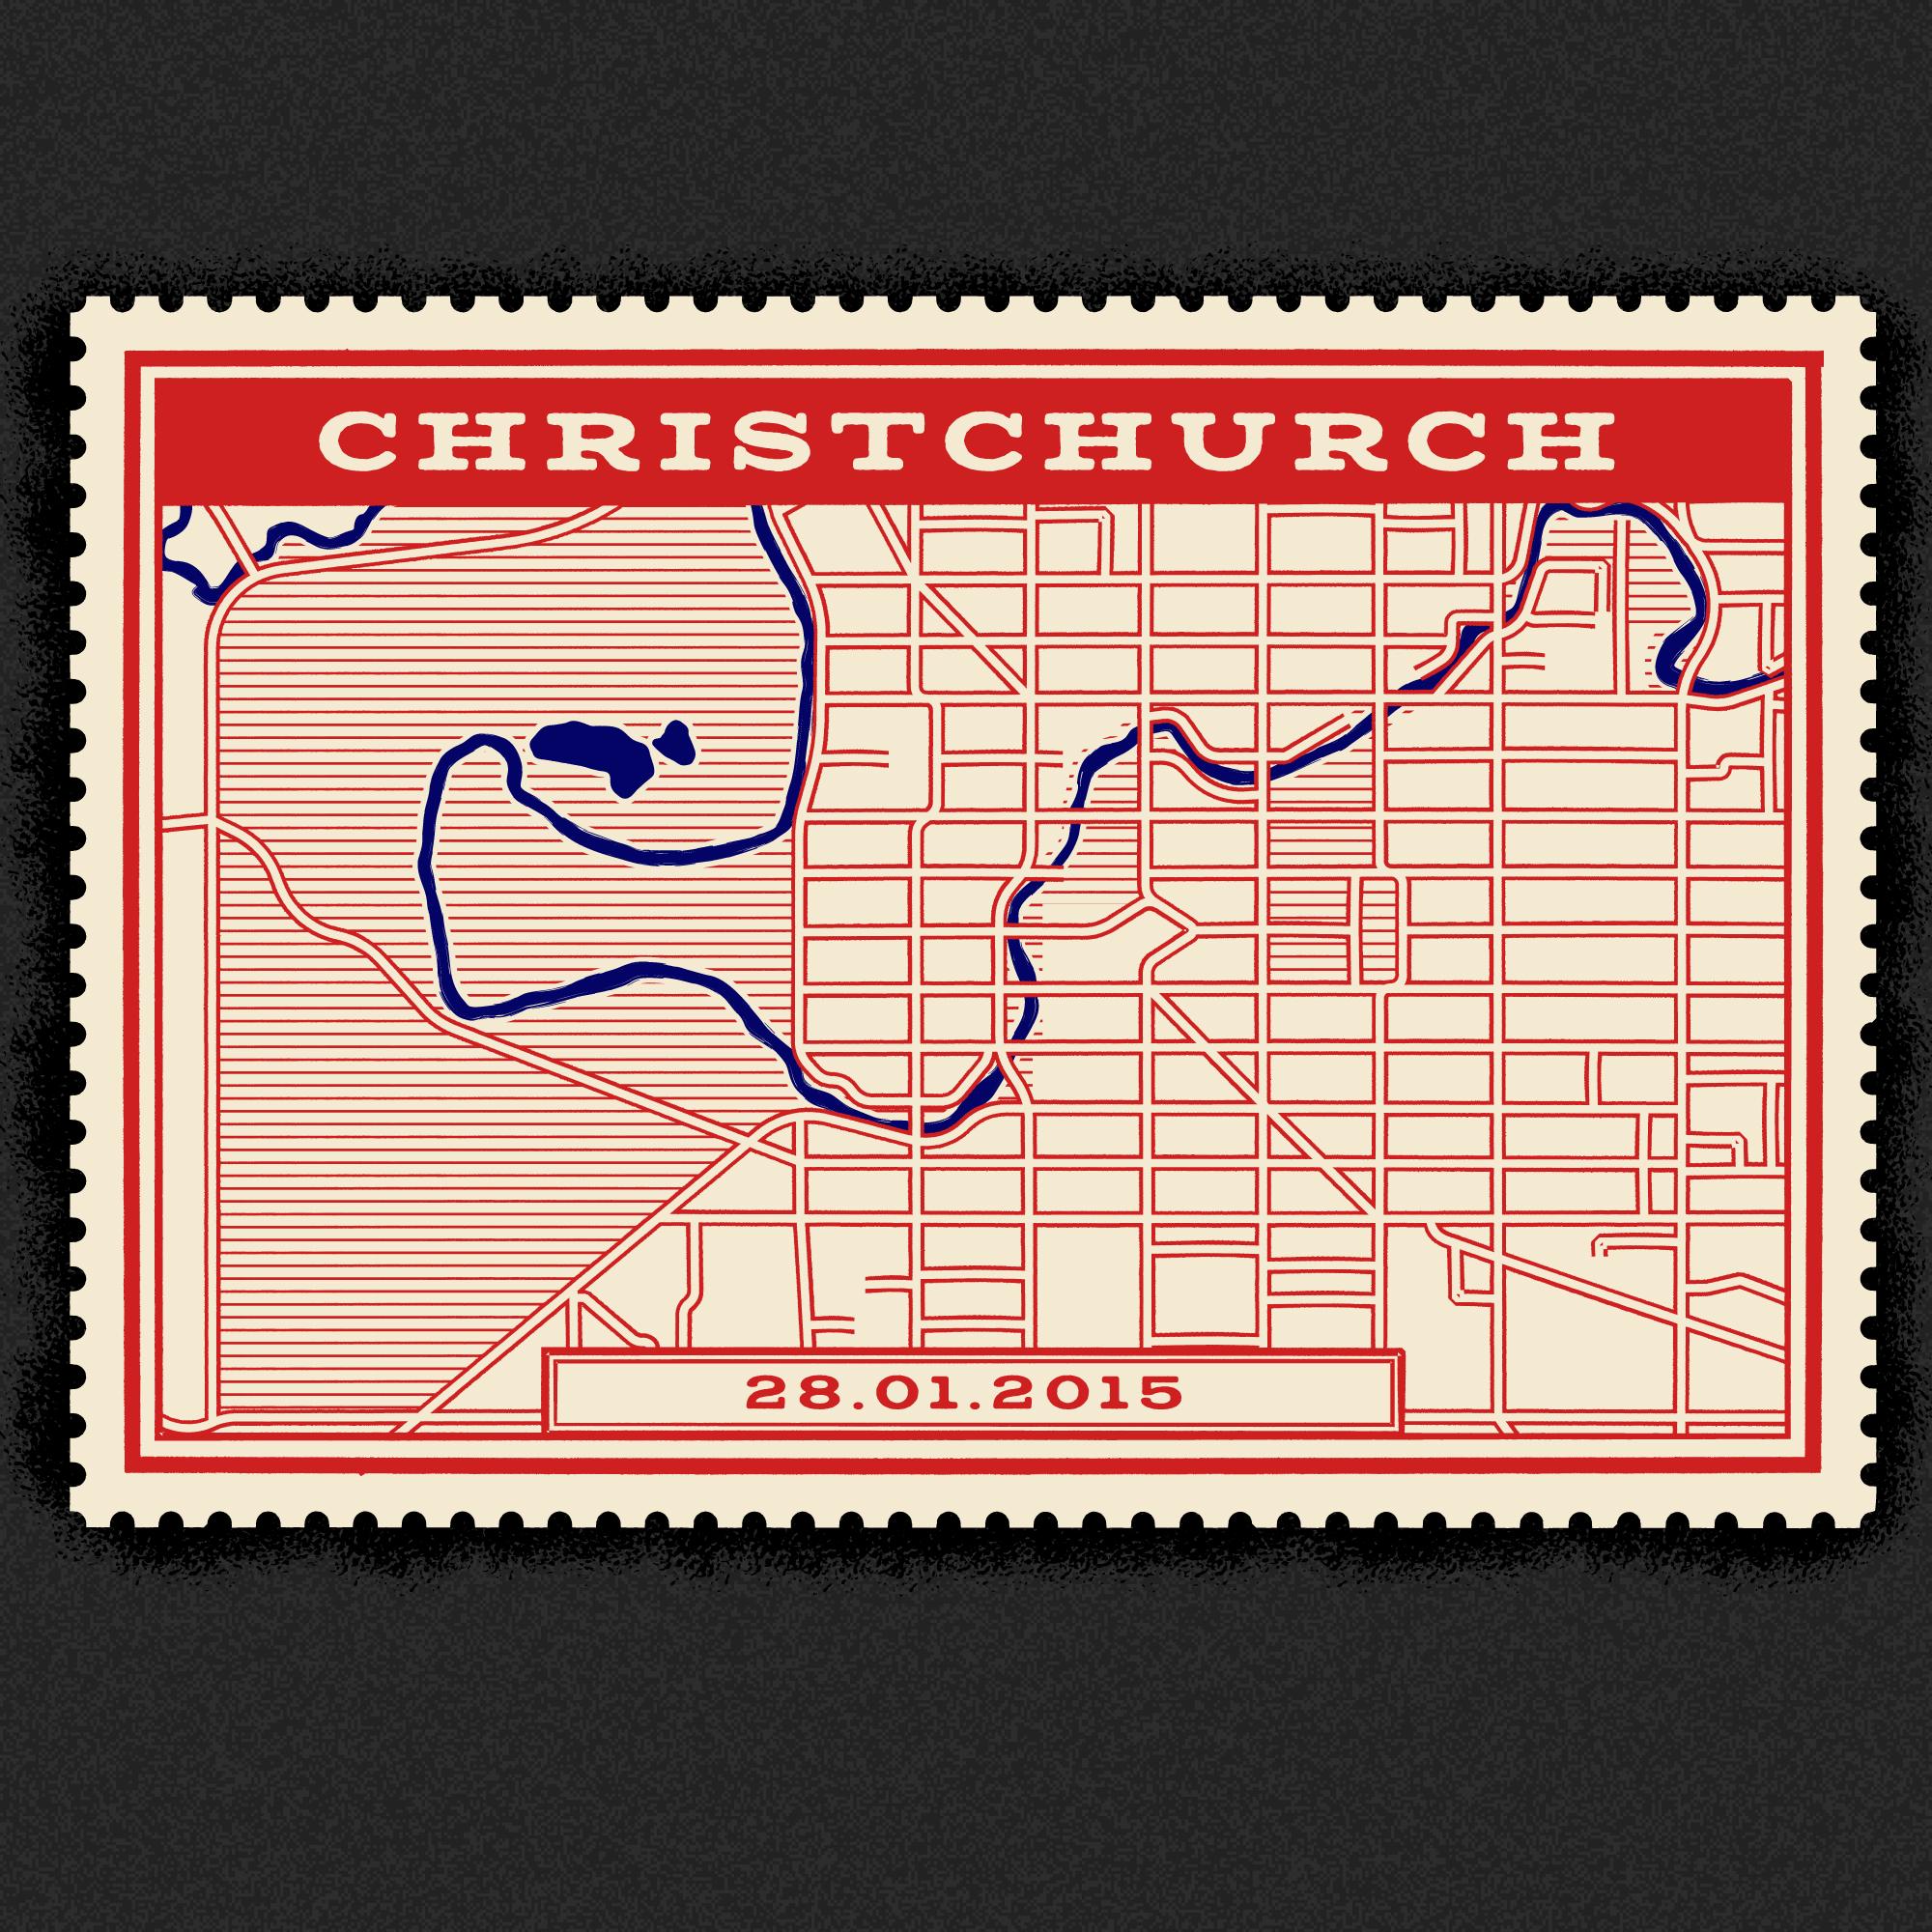 Vintage Christchurch map stamp